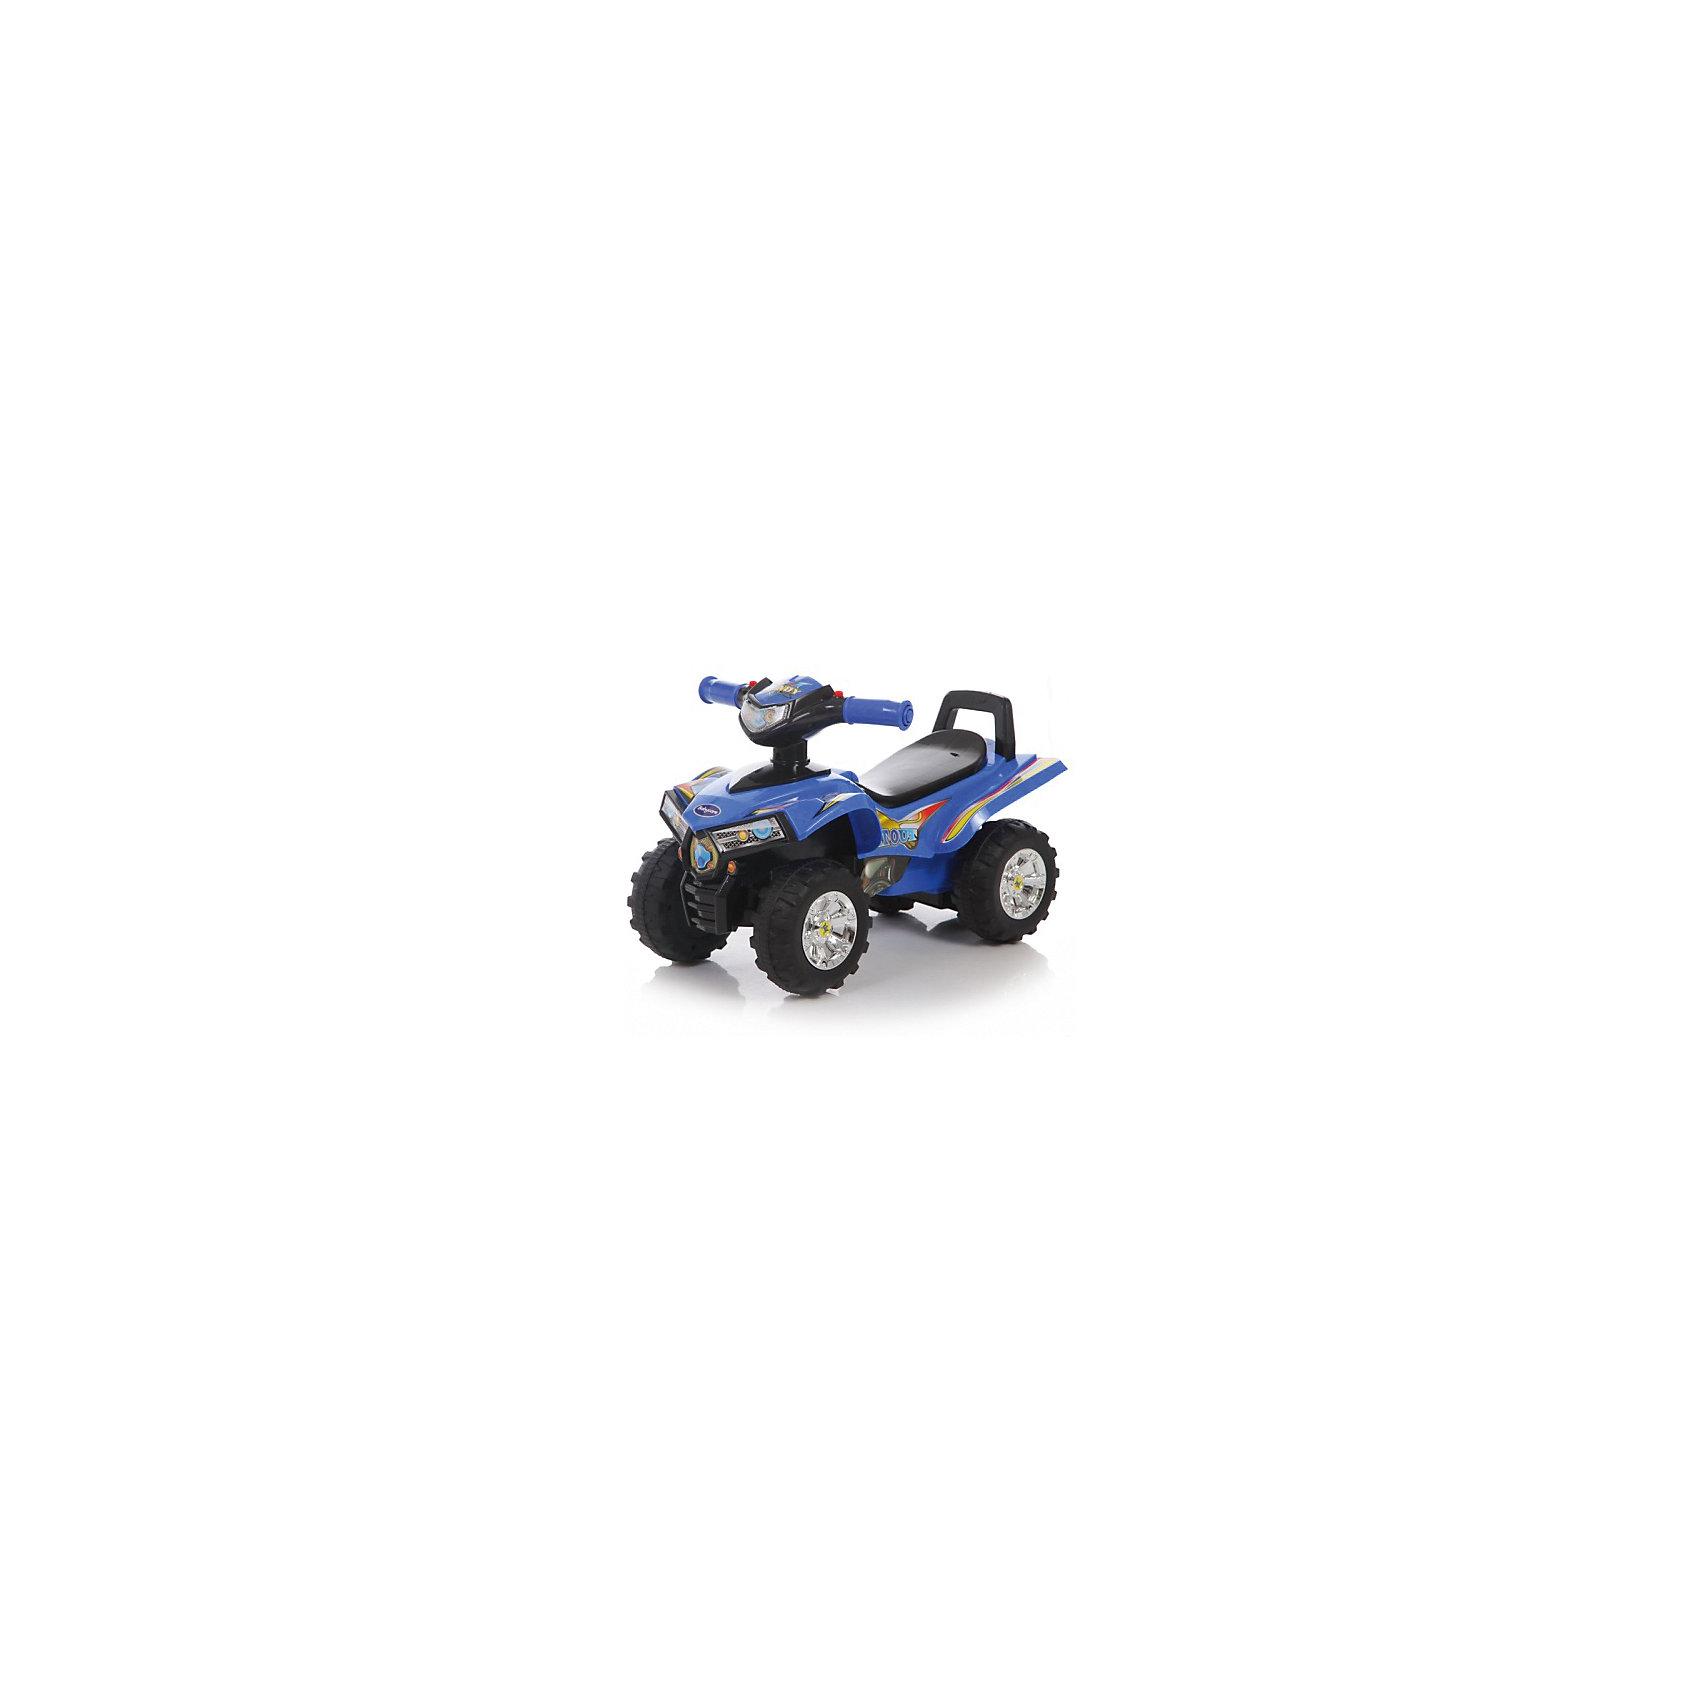 Каталка детская Super ATV, синяя, Baby CareМашинки-каталки<br><br><br>Ширина мм: 600<br>Глубина мм: 260<br>Высота мм: 300<br>Вес г: 3100<br>Возраст от месяцев: 12<br>Возраст до месяцев: 36<br>Пол: Унисекс<br>Возраст: Детский<br>SKU: 5558856